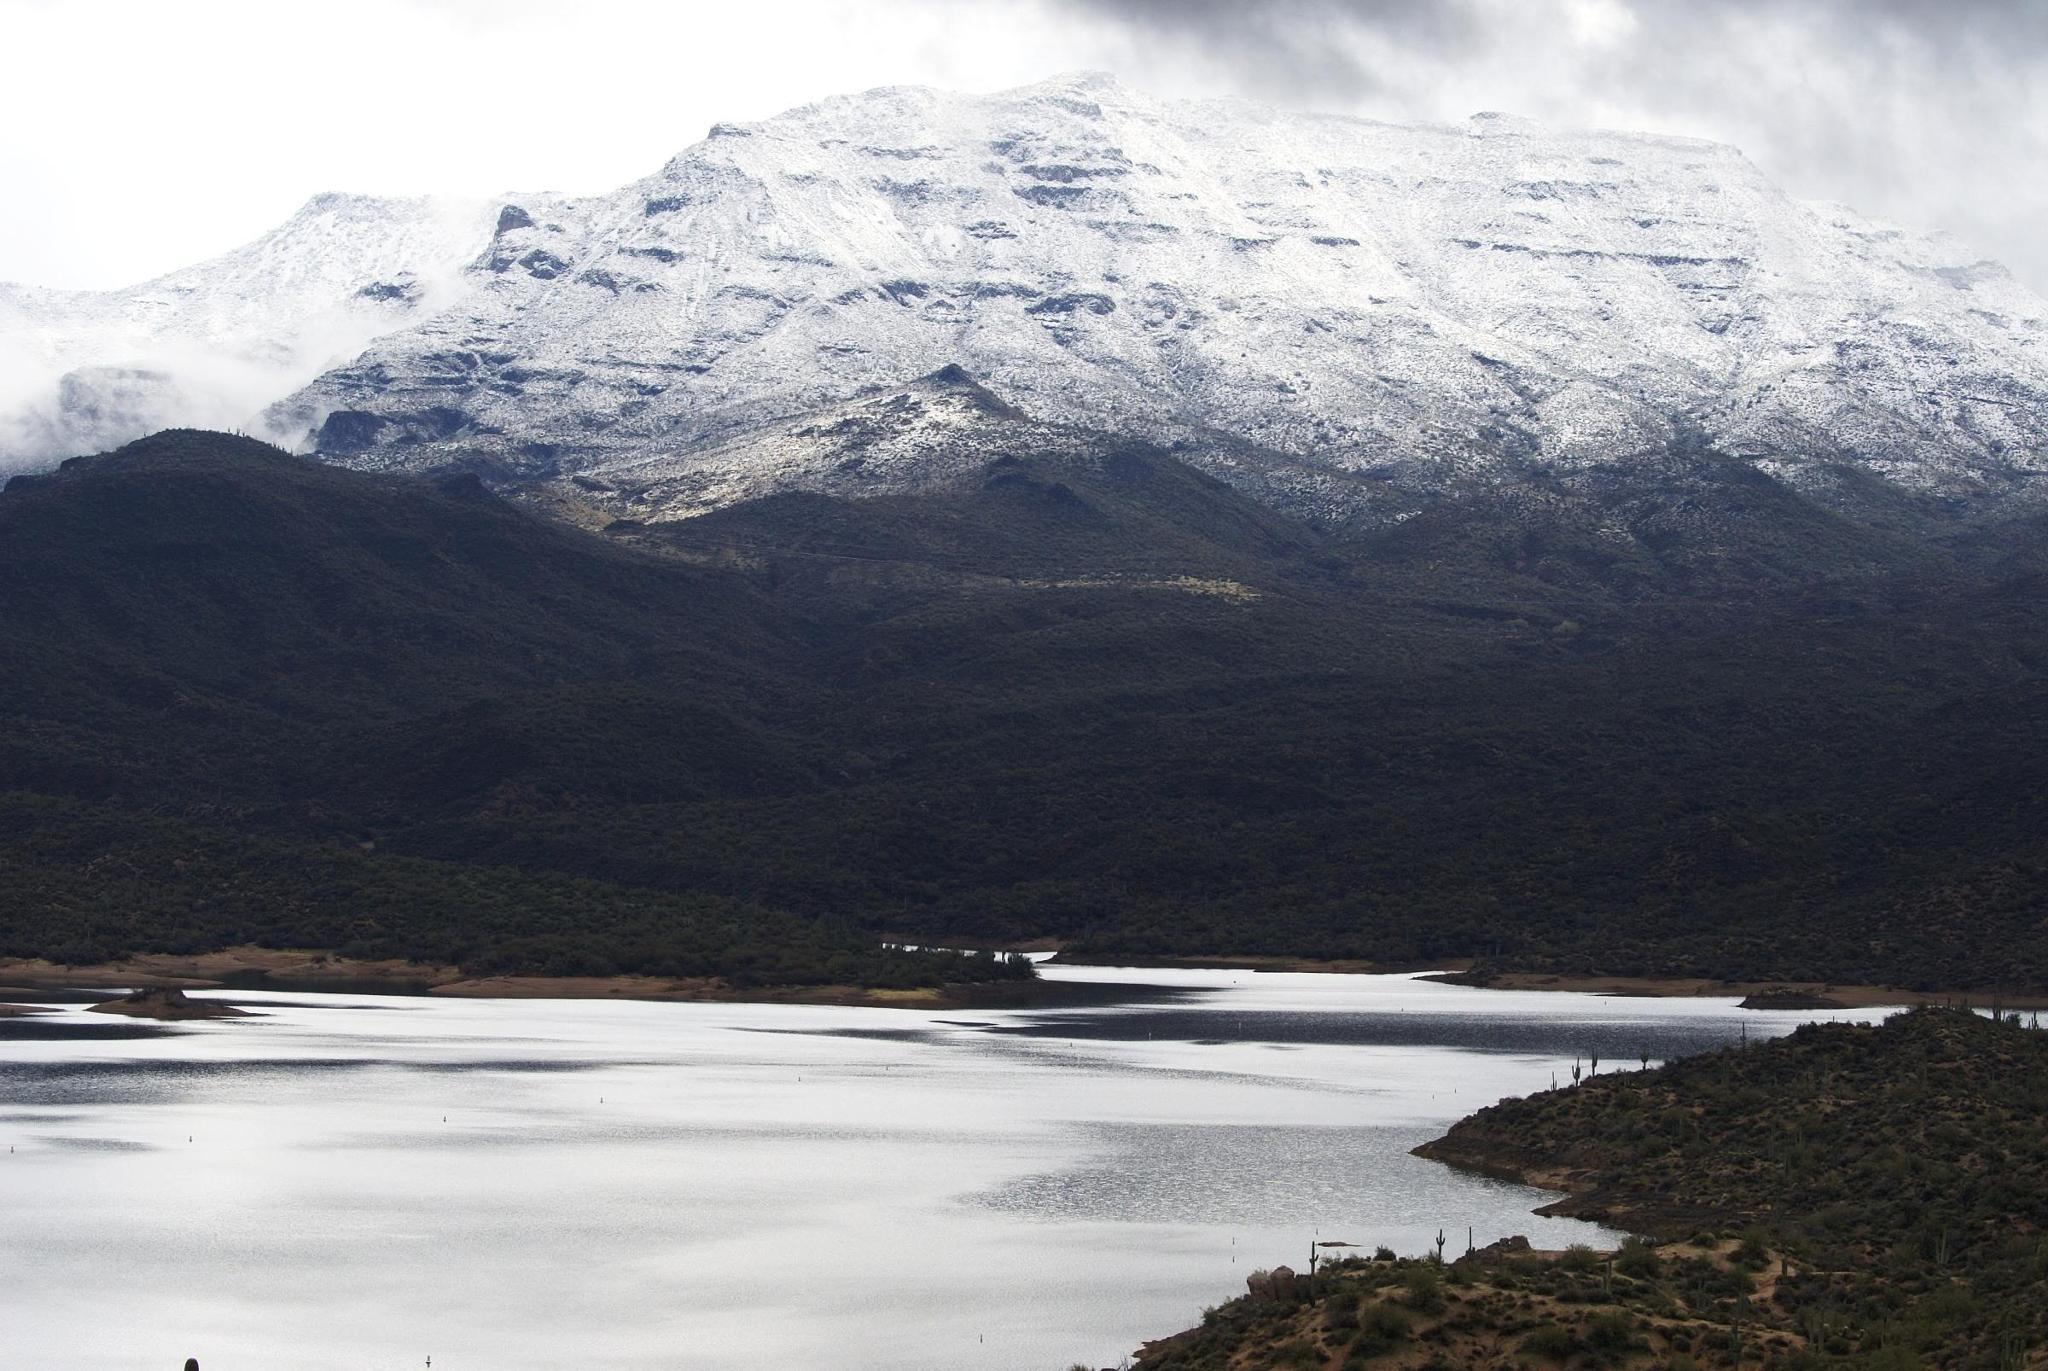 Bartlett Lake scenics by PhxRick